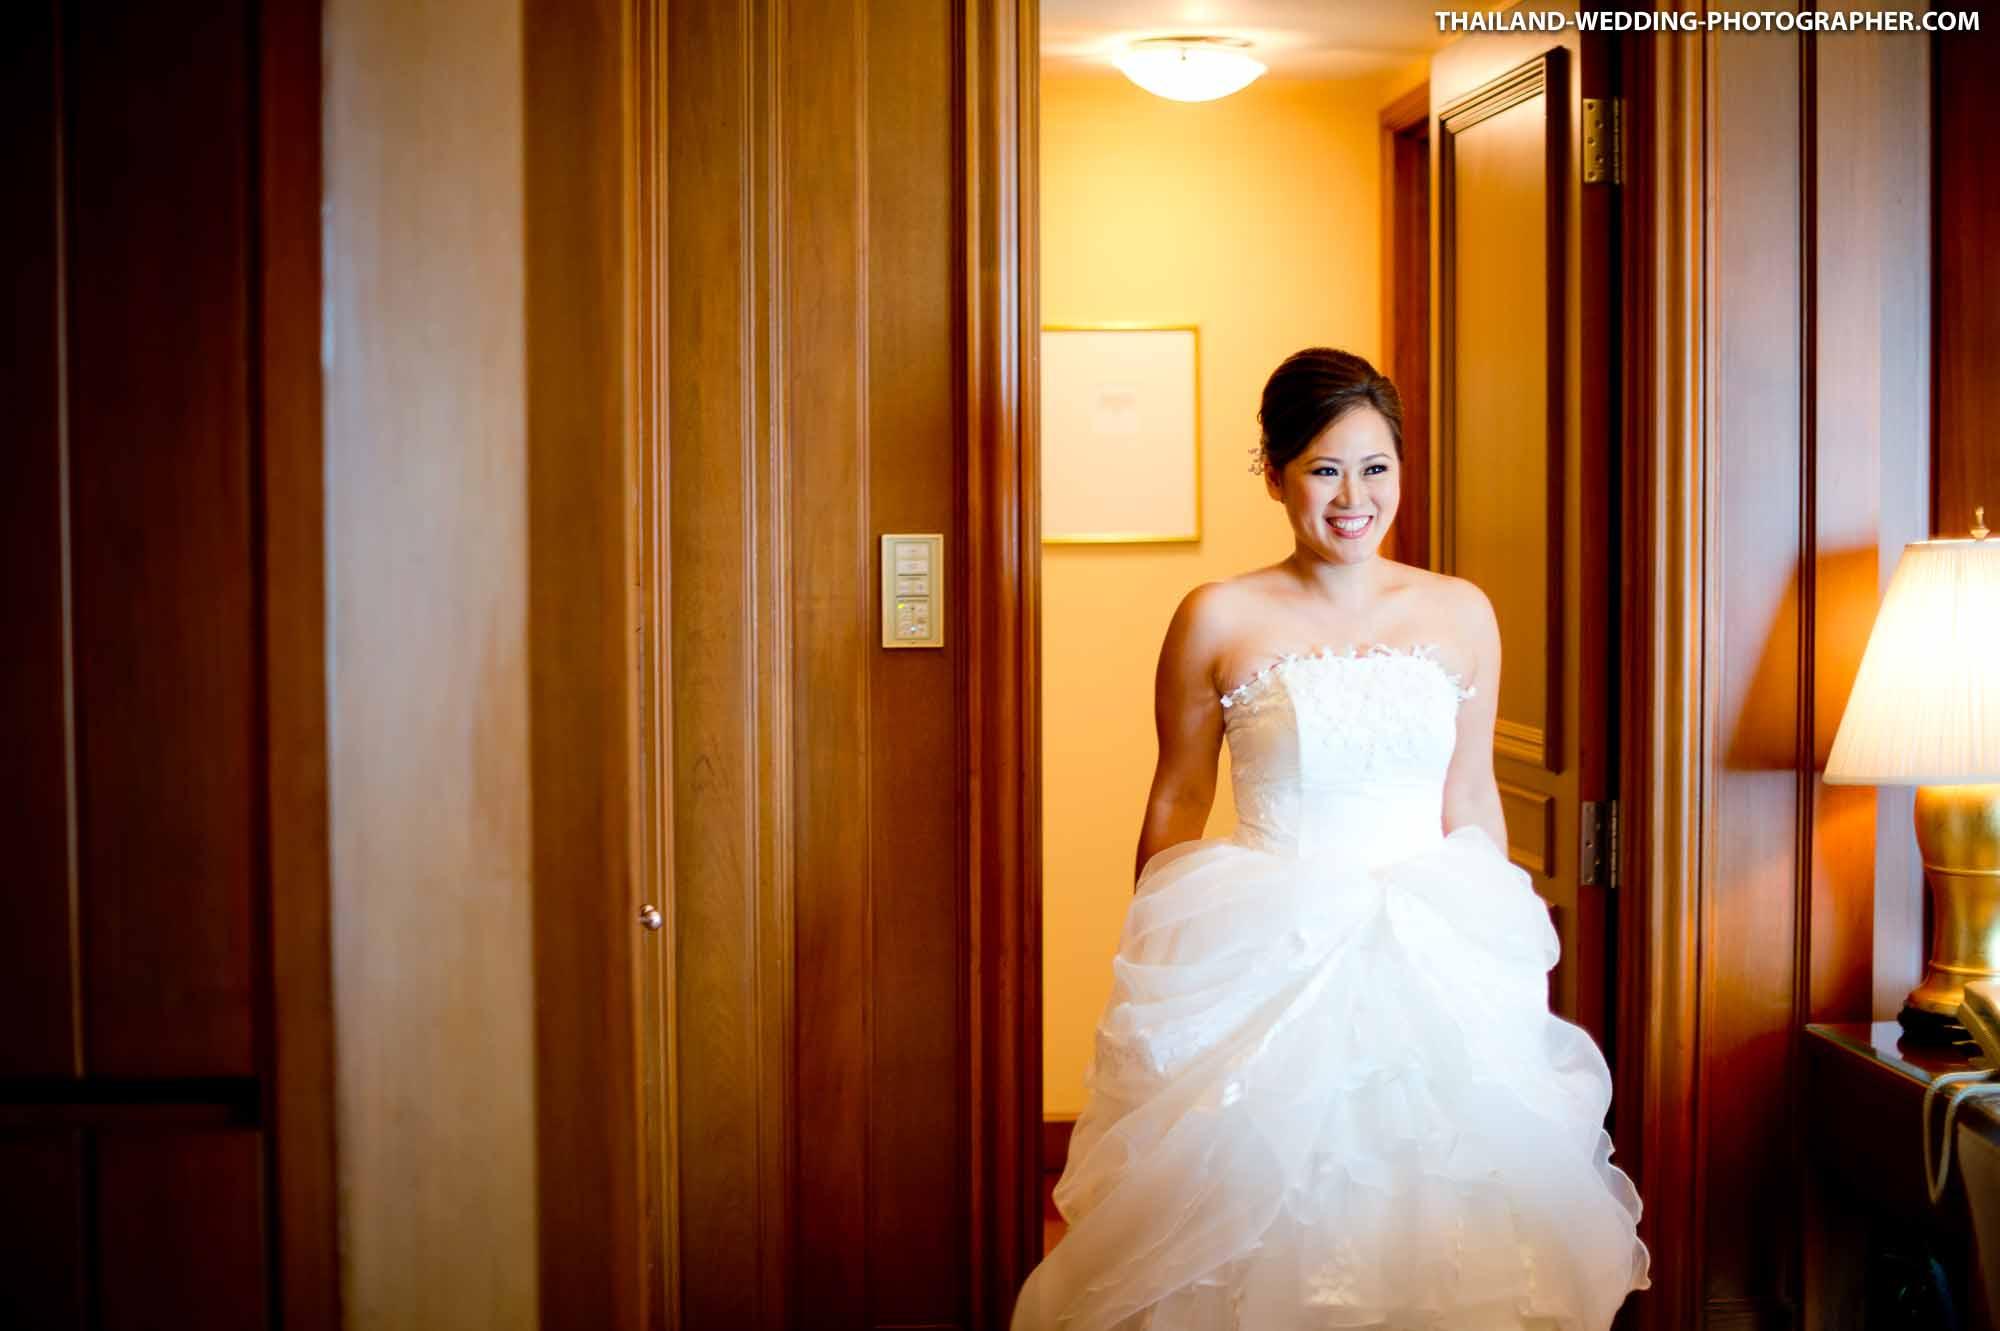 The Peninsula Bangkok Thailand Wedding Photography